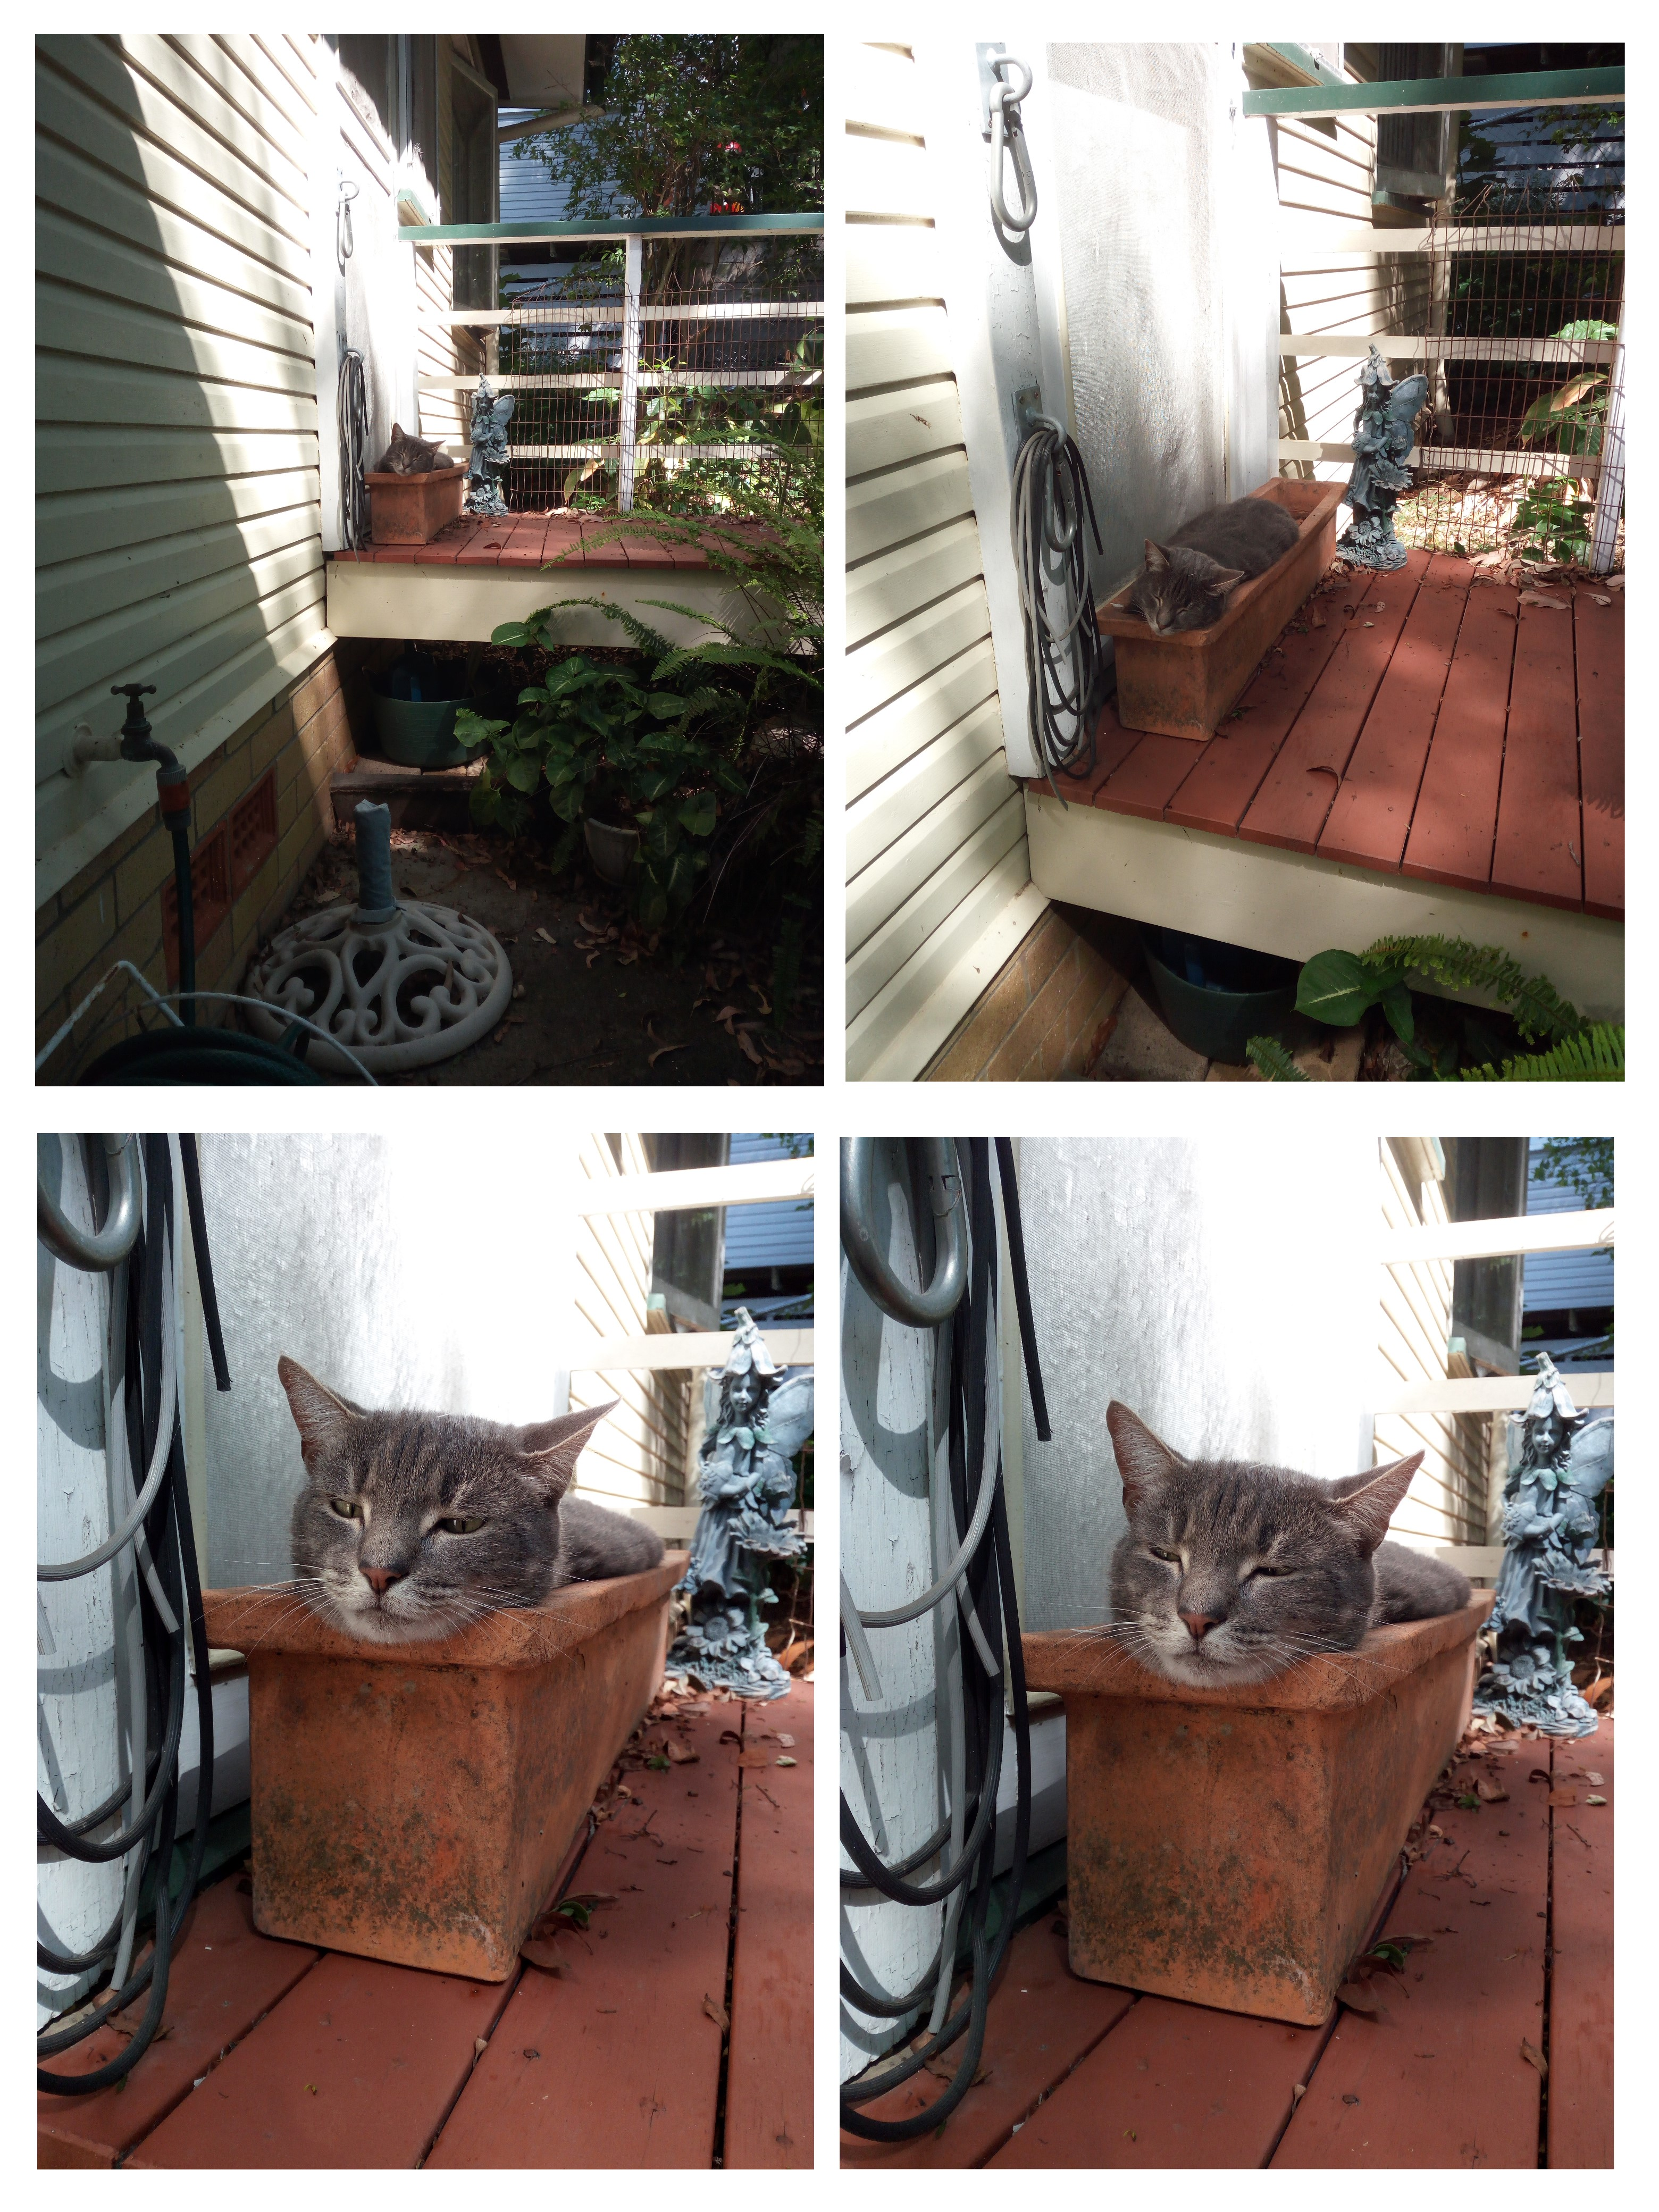 JoJo Cat Asleep In Planter Box Jan2021